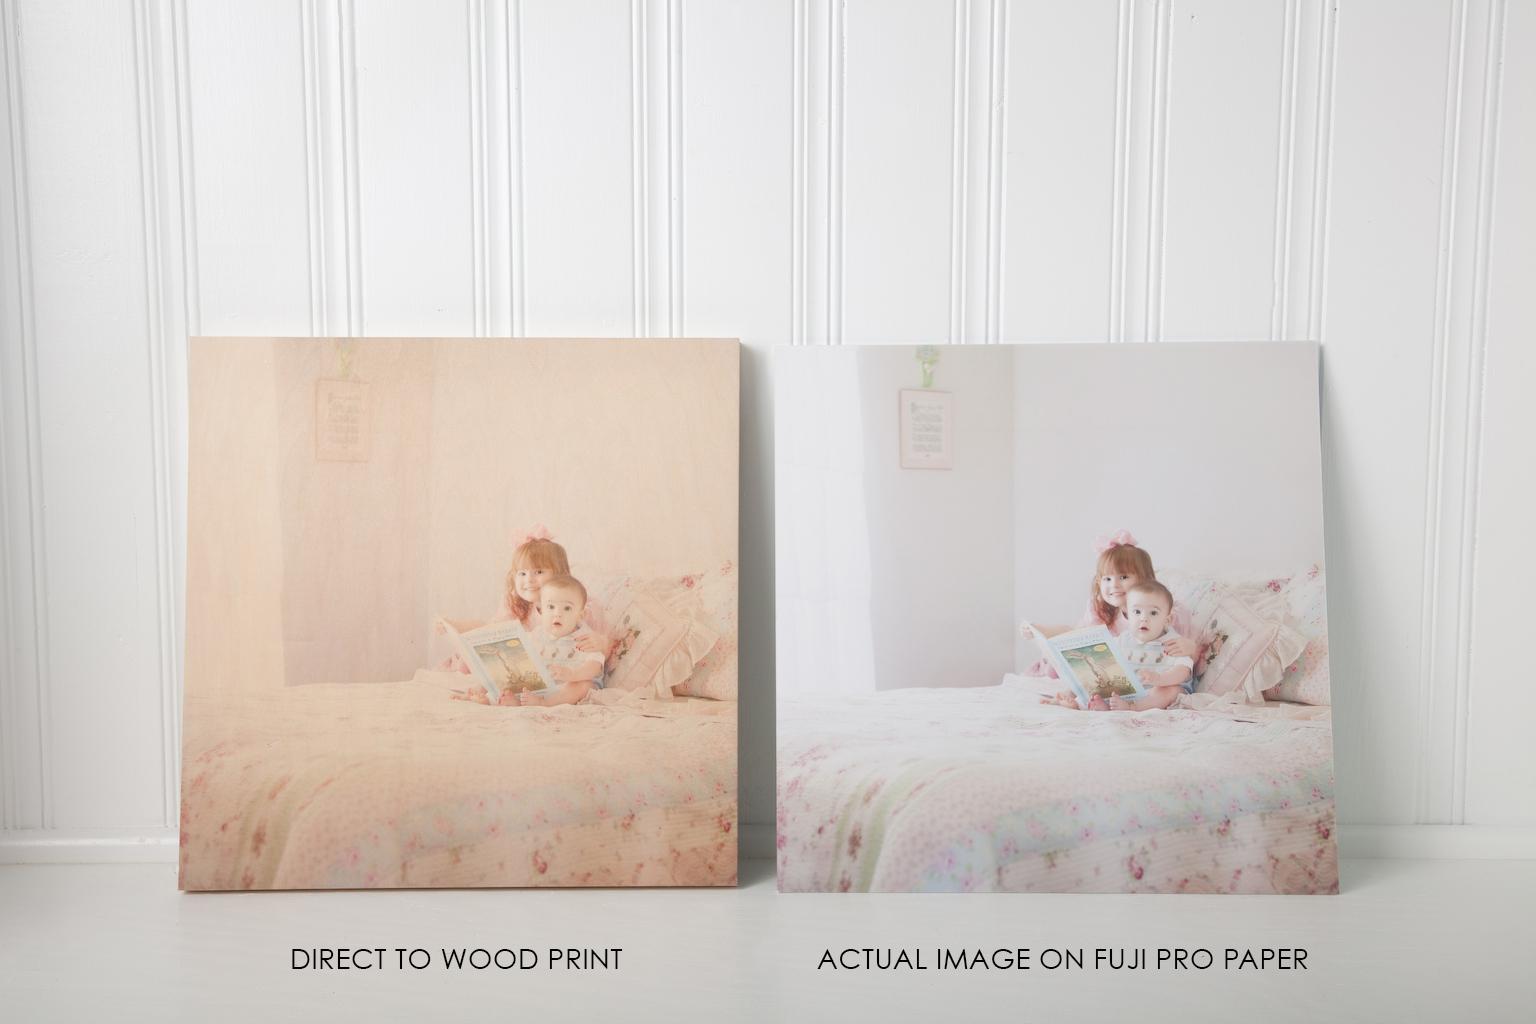 Direct To Wood Photo Print vs Fuji Pro Print